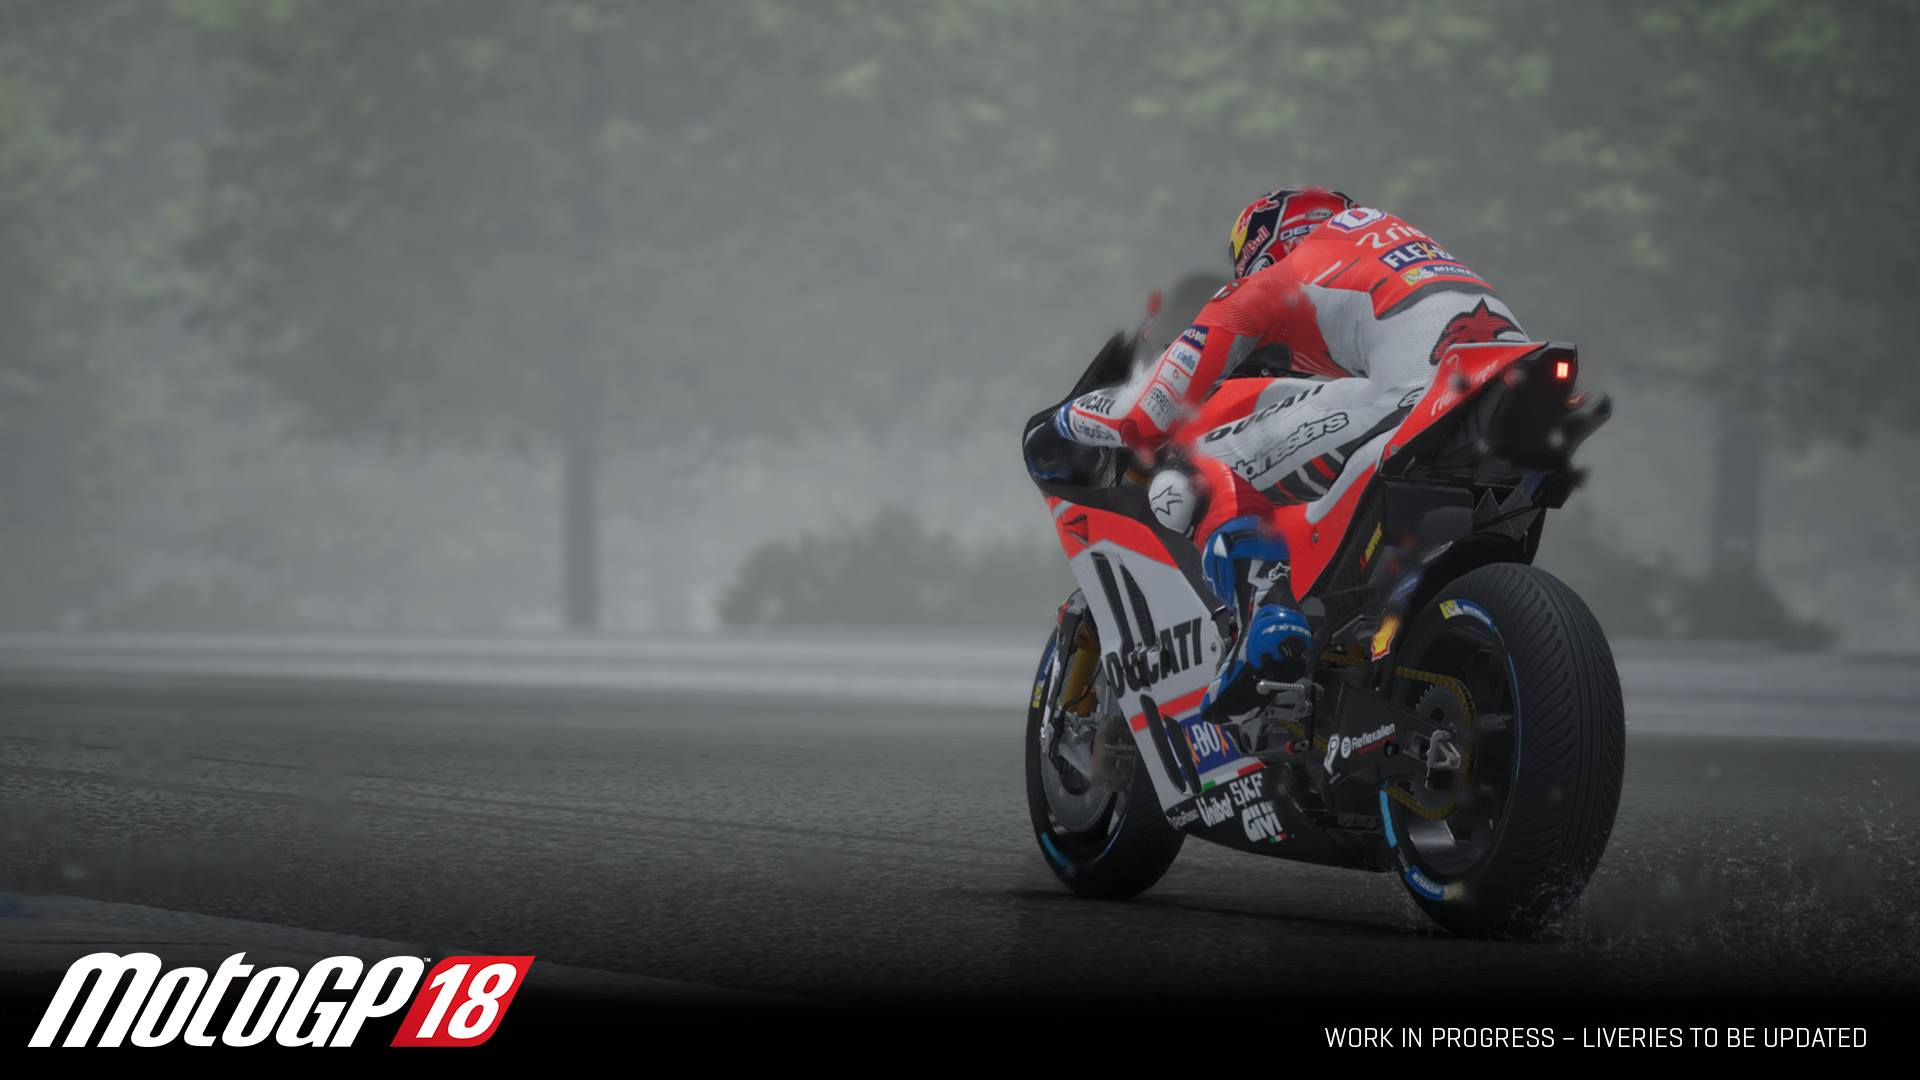 motogp18 gameplay